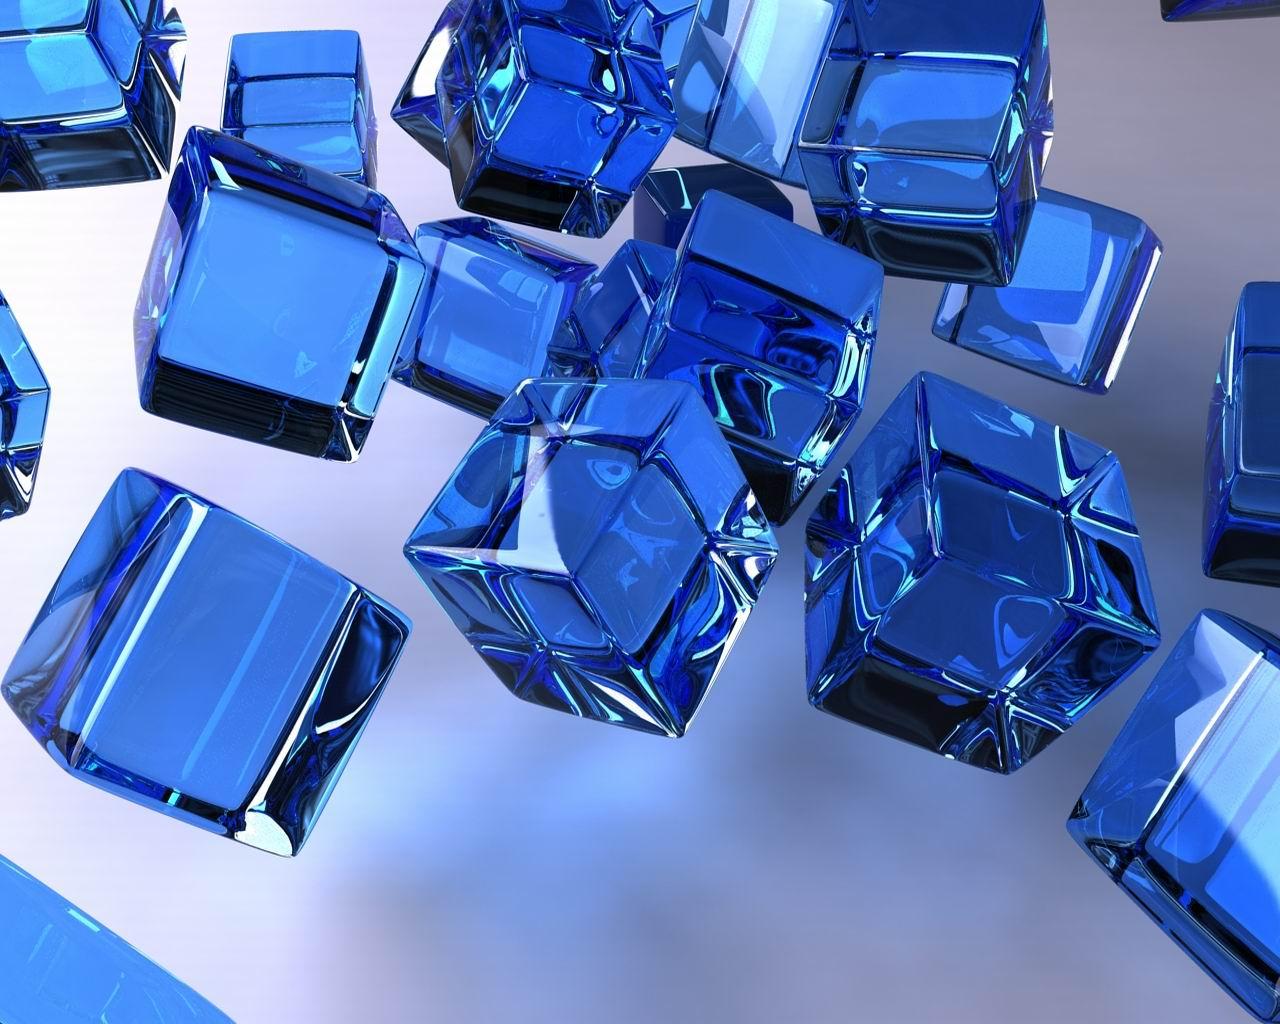 Imagini pt Desktop 3d Imagini Desktop Posted by